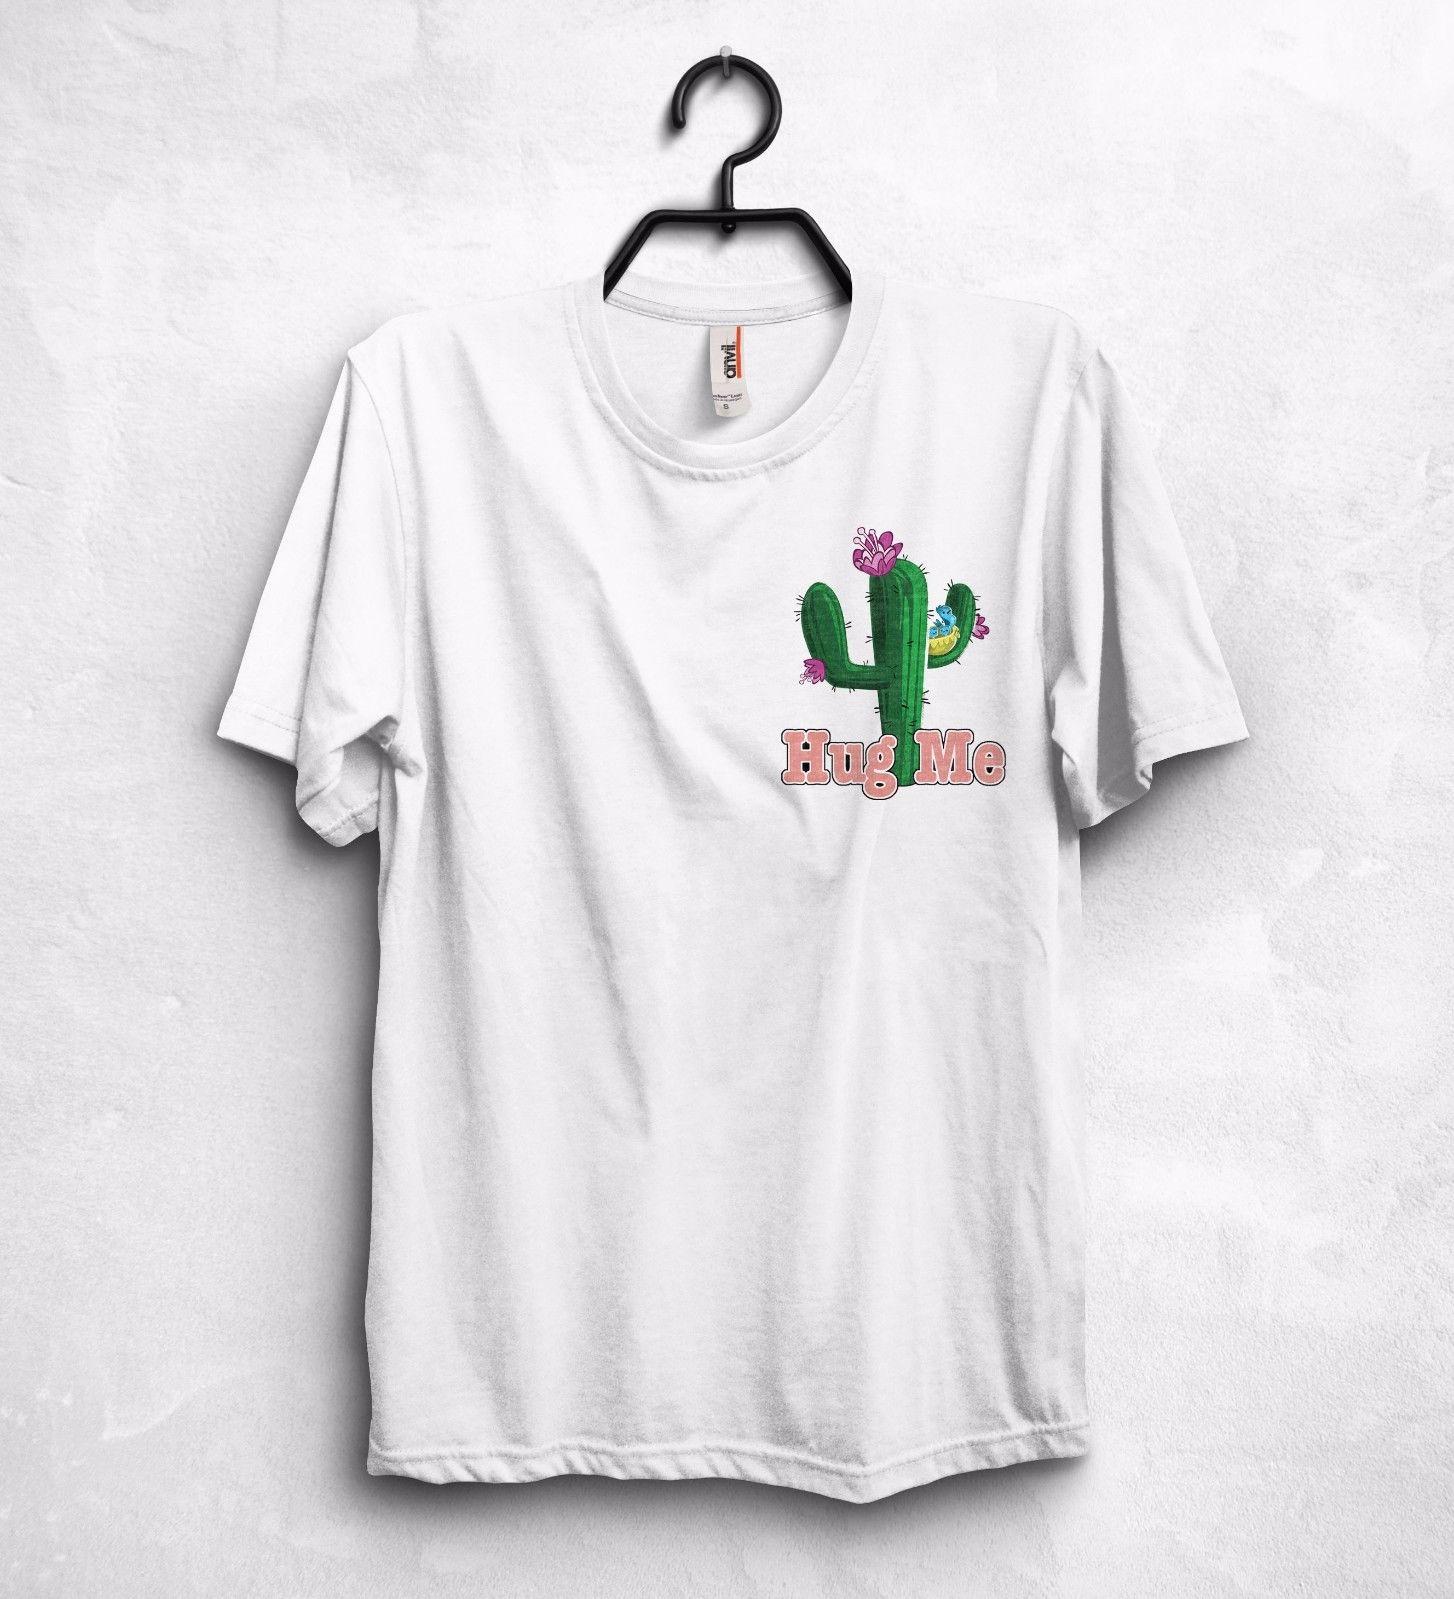 Shirt design green - Hug Me Cactus Corporation T Shirt Top Cool Sweet Logo Gift Love Design Funny Printing Casual